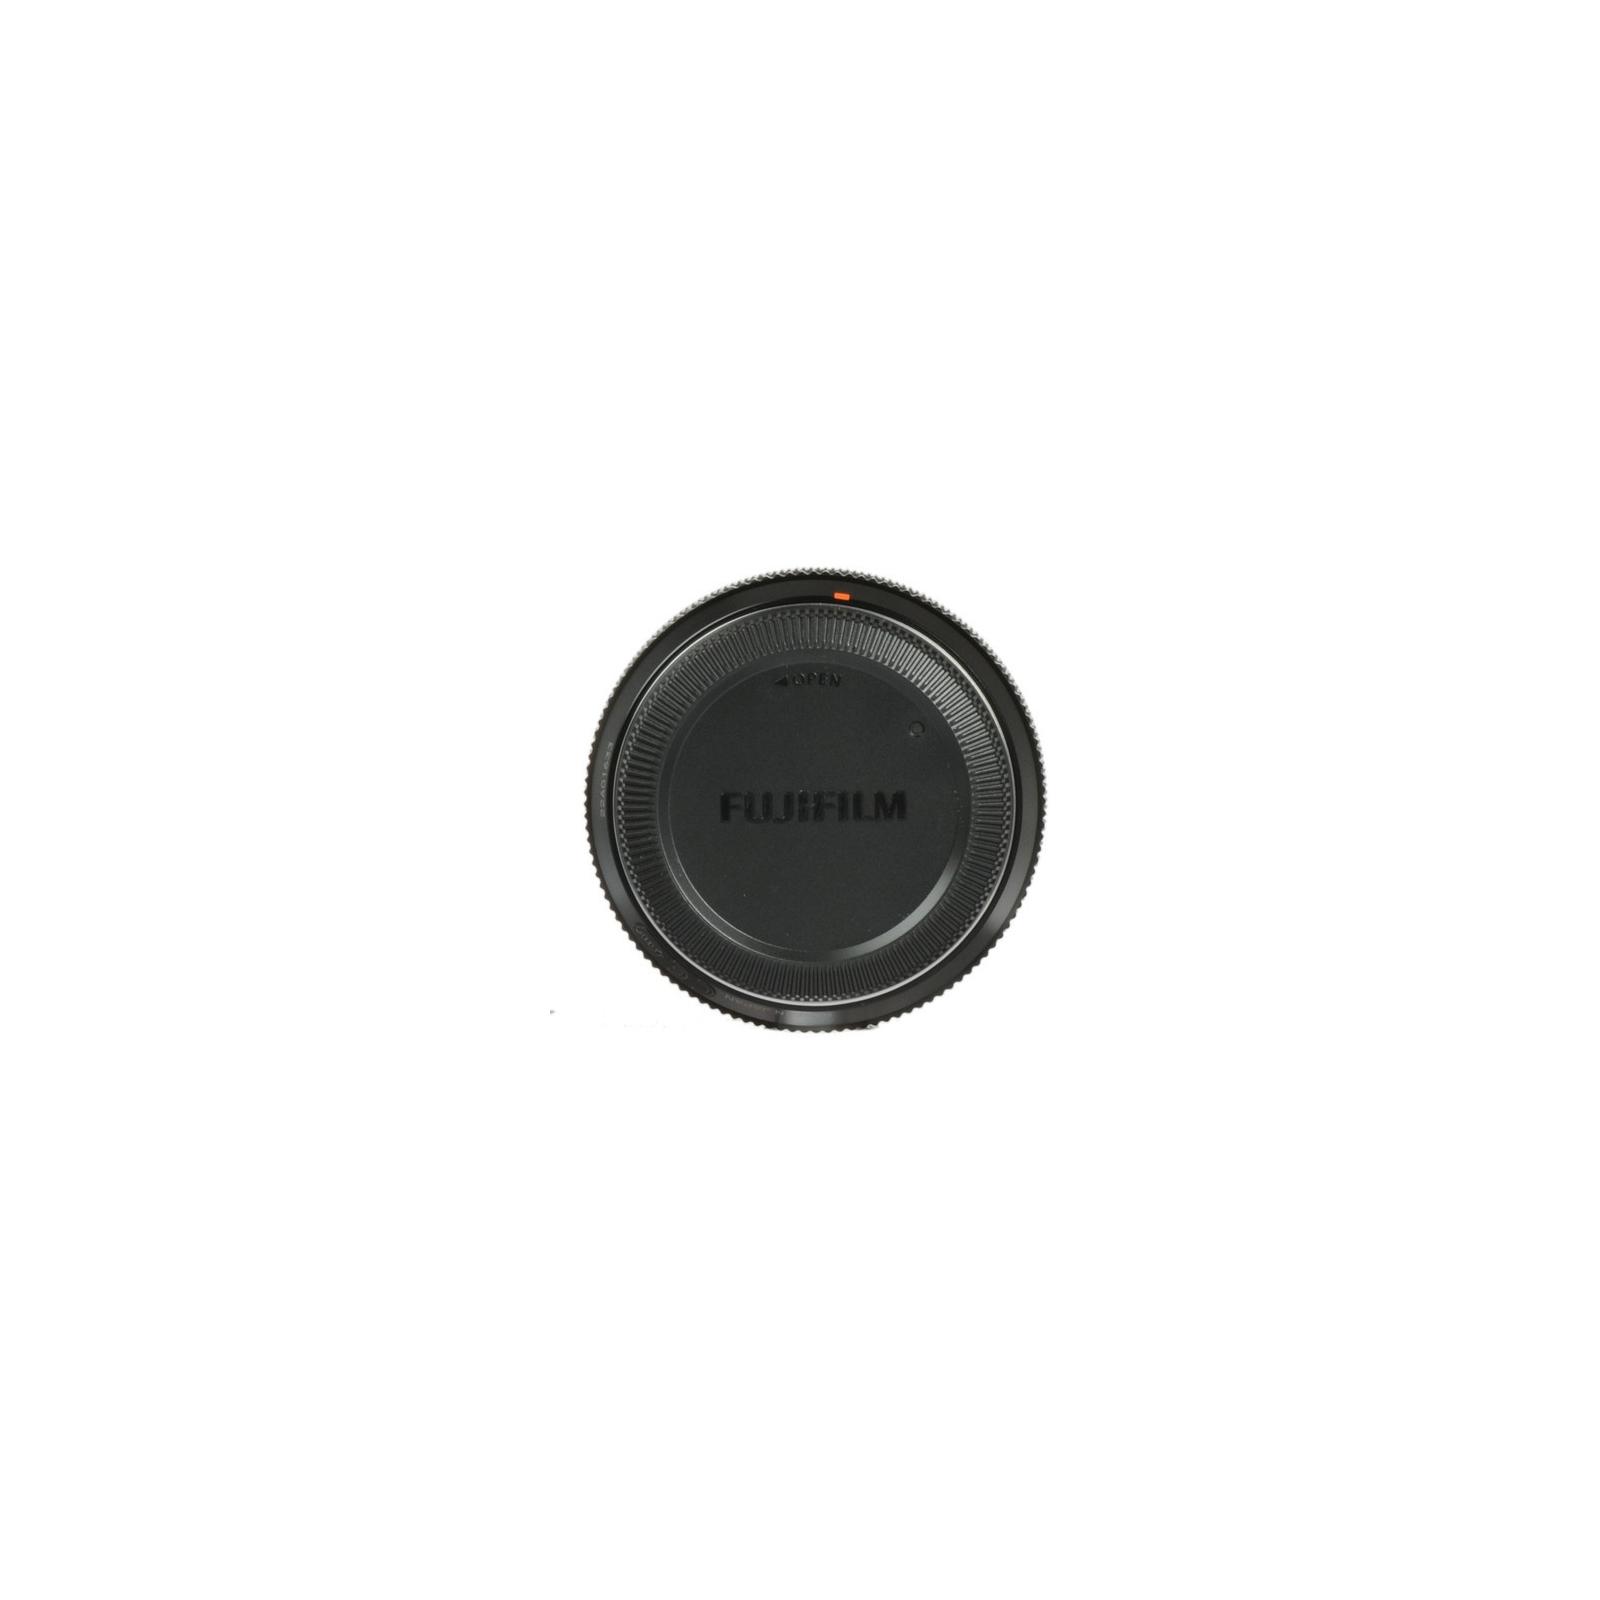 Объектив Fujifilm XF-60mm F2.4 R Macro (16240767) изображение 6